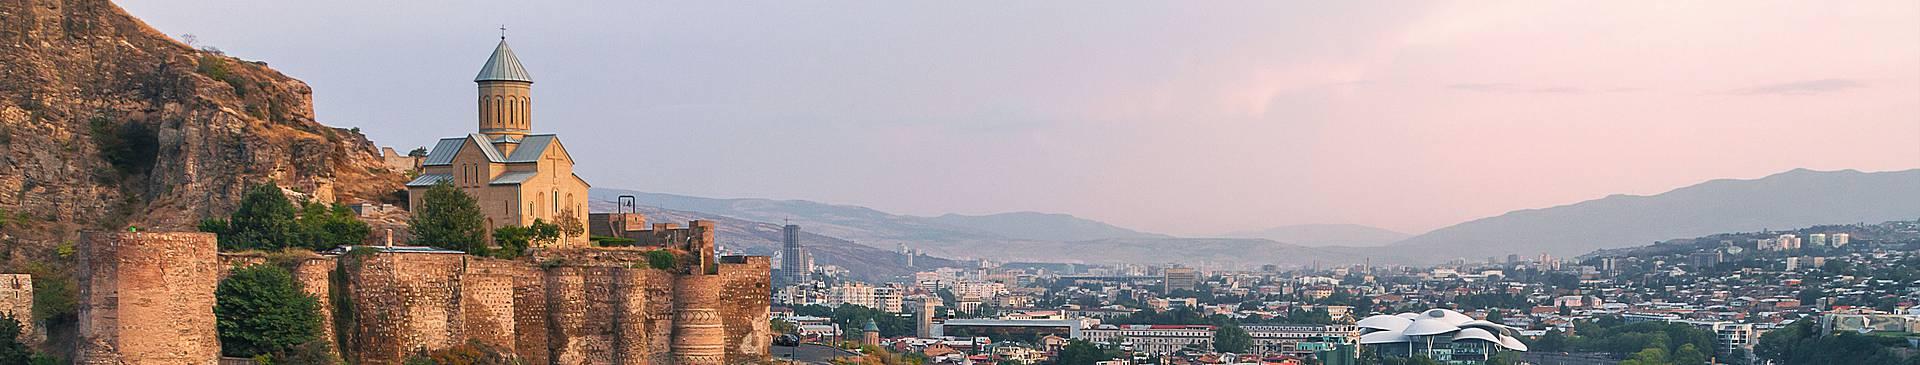 Städtereise Georgien